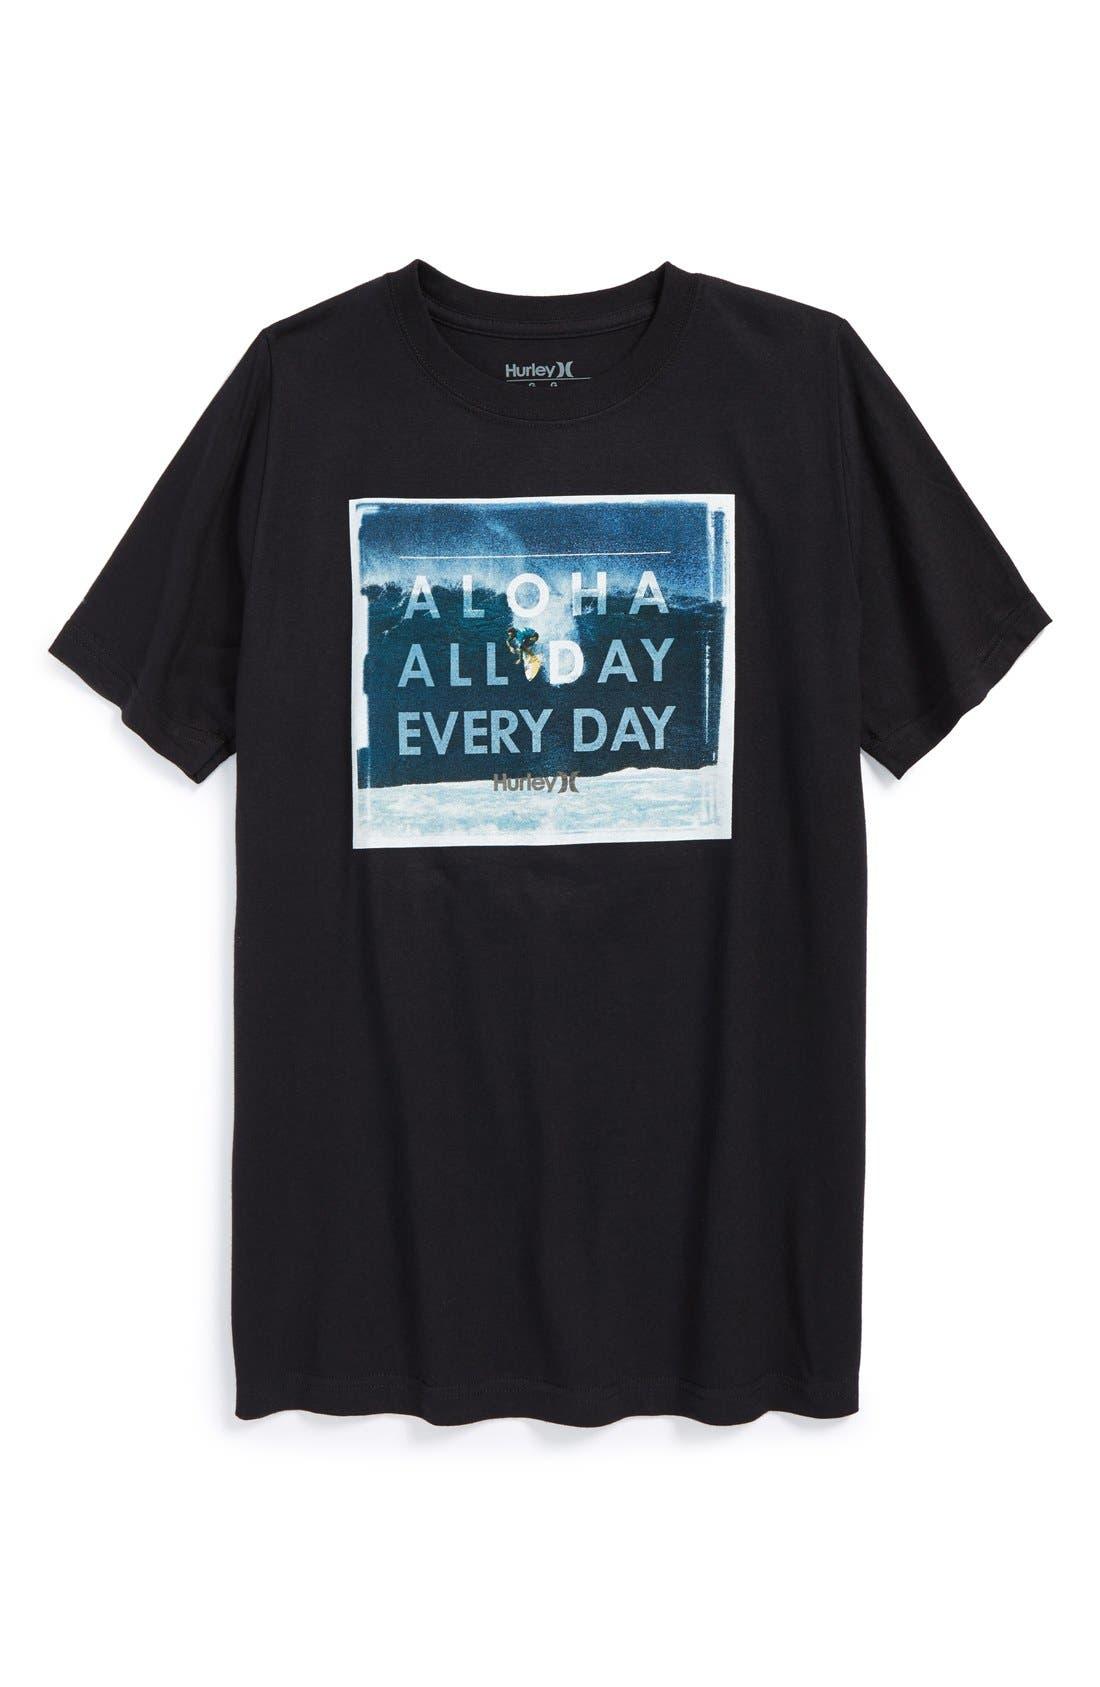 HURLEY 'Aloha All Day Every Day' Screenprint T-Shirt, Main, color, 001